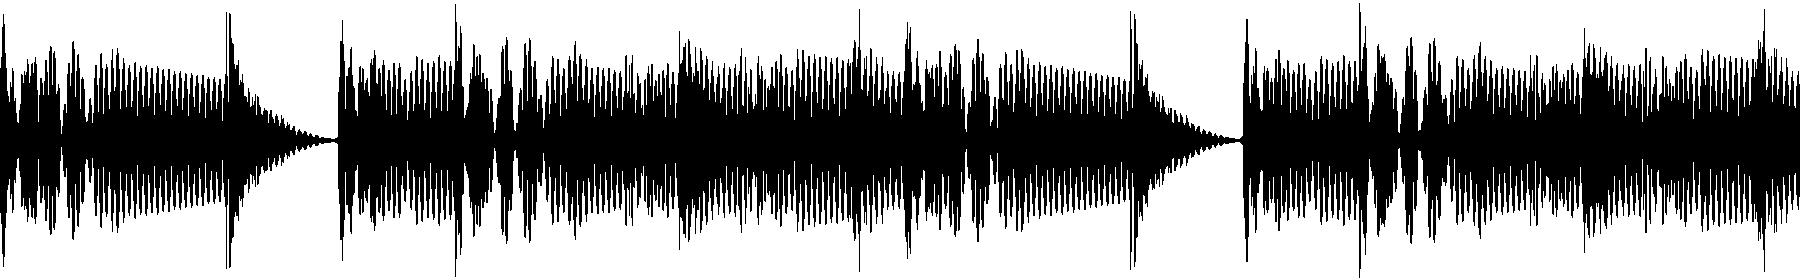 blbc cruisindrums 130 01